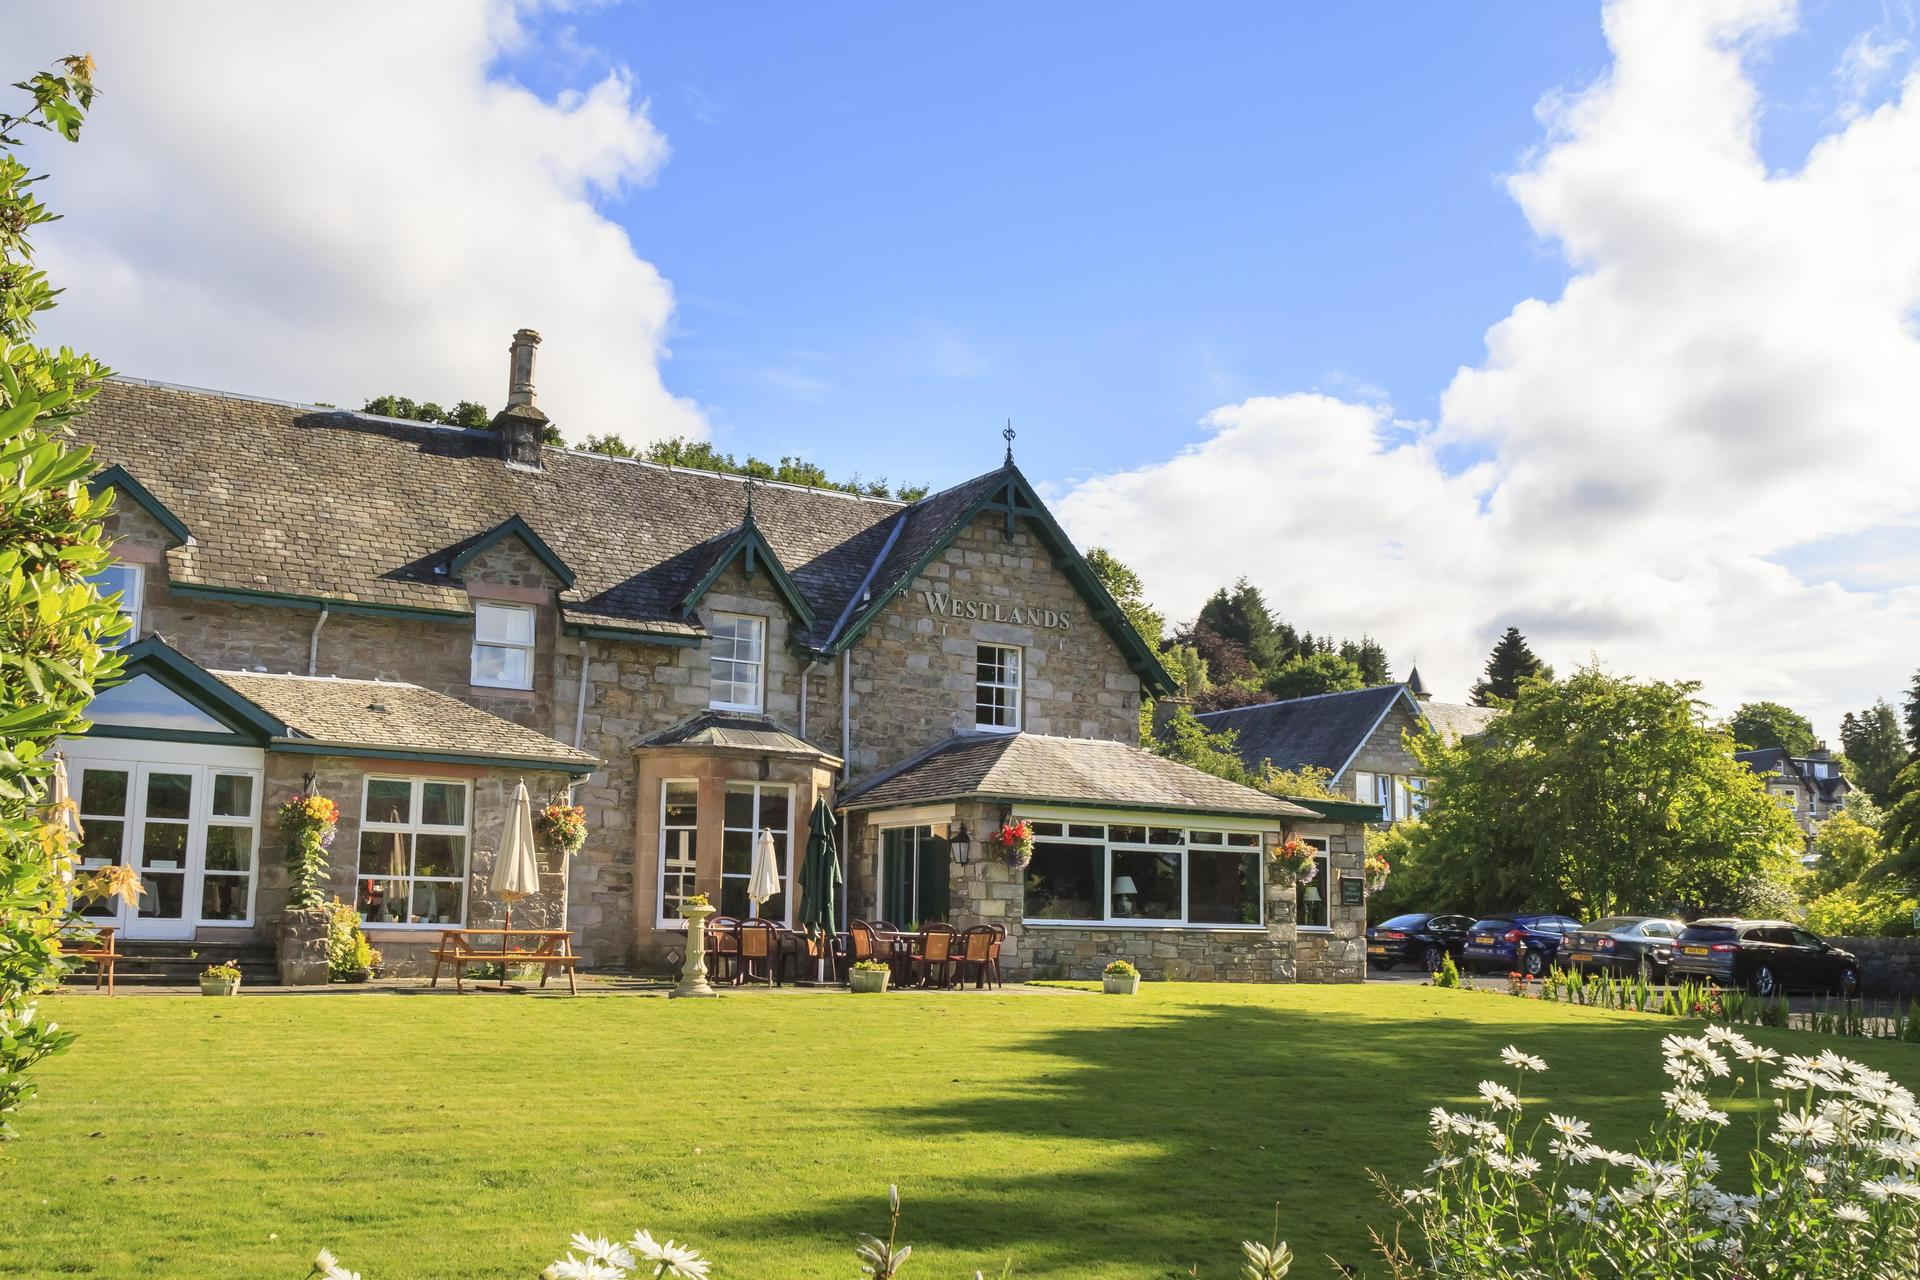 Westlands Of Pitlochry in Scotland